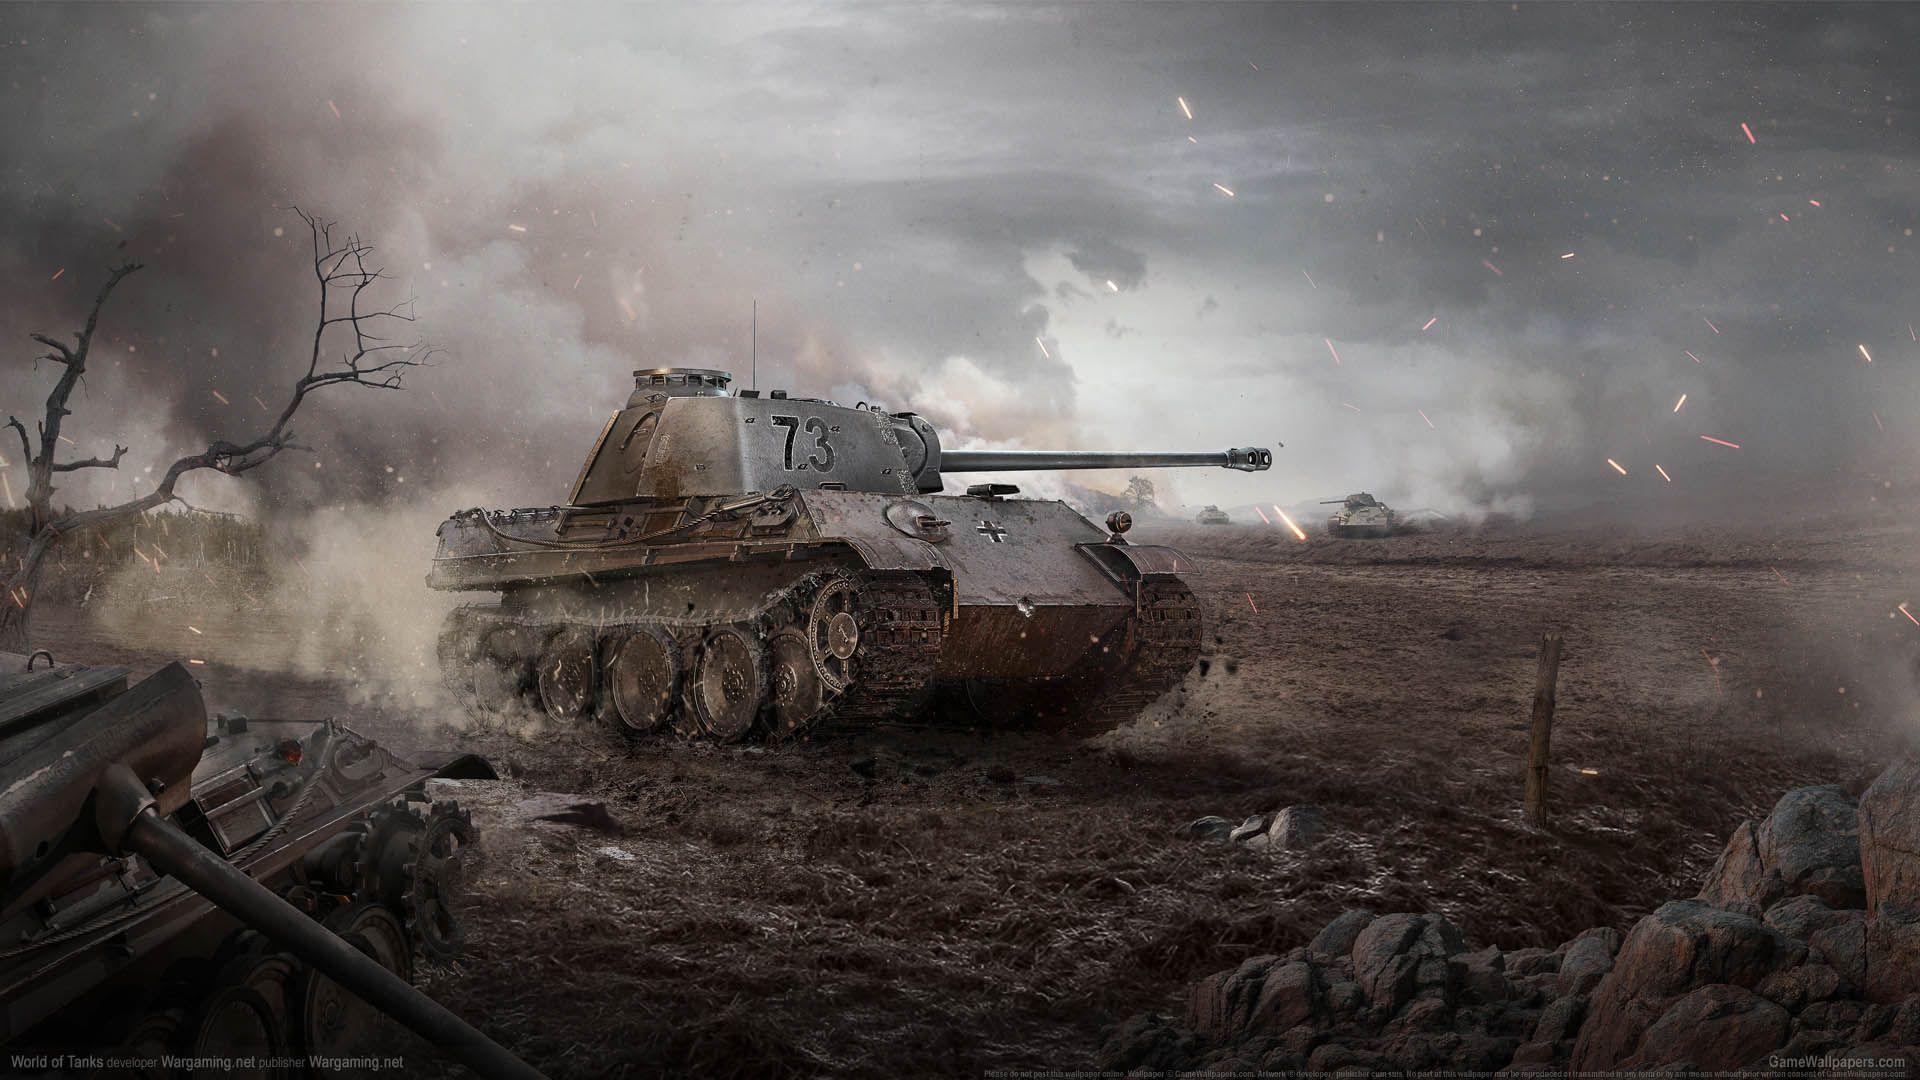 World Of Tanks Wallpaper 25 1920x1080 Tank Wallpaper